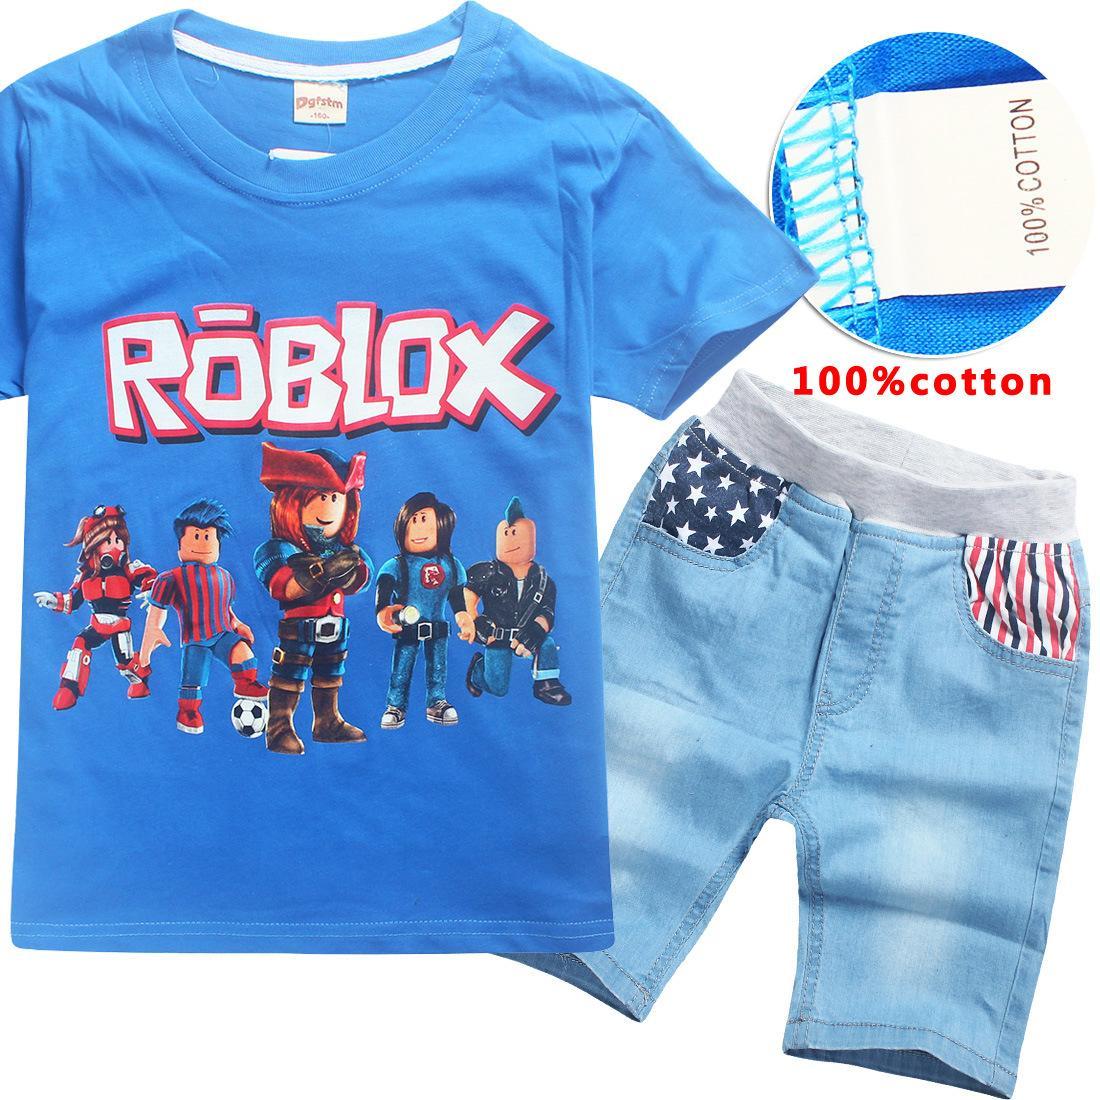 Roblox Korean Fashion 2020 Cotton 6 14 Years Boys Summer Dress Jeans Set Roblox